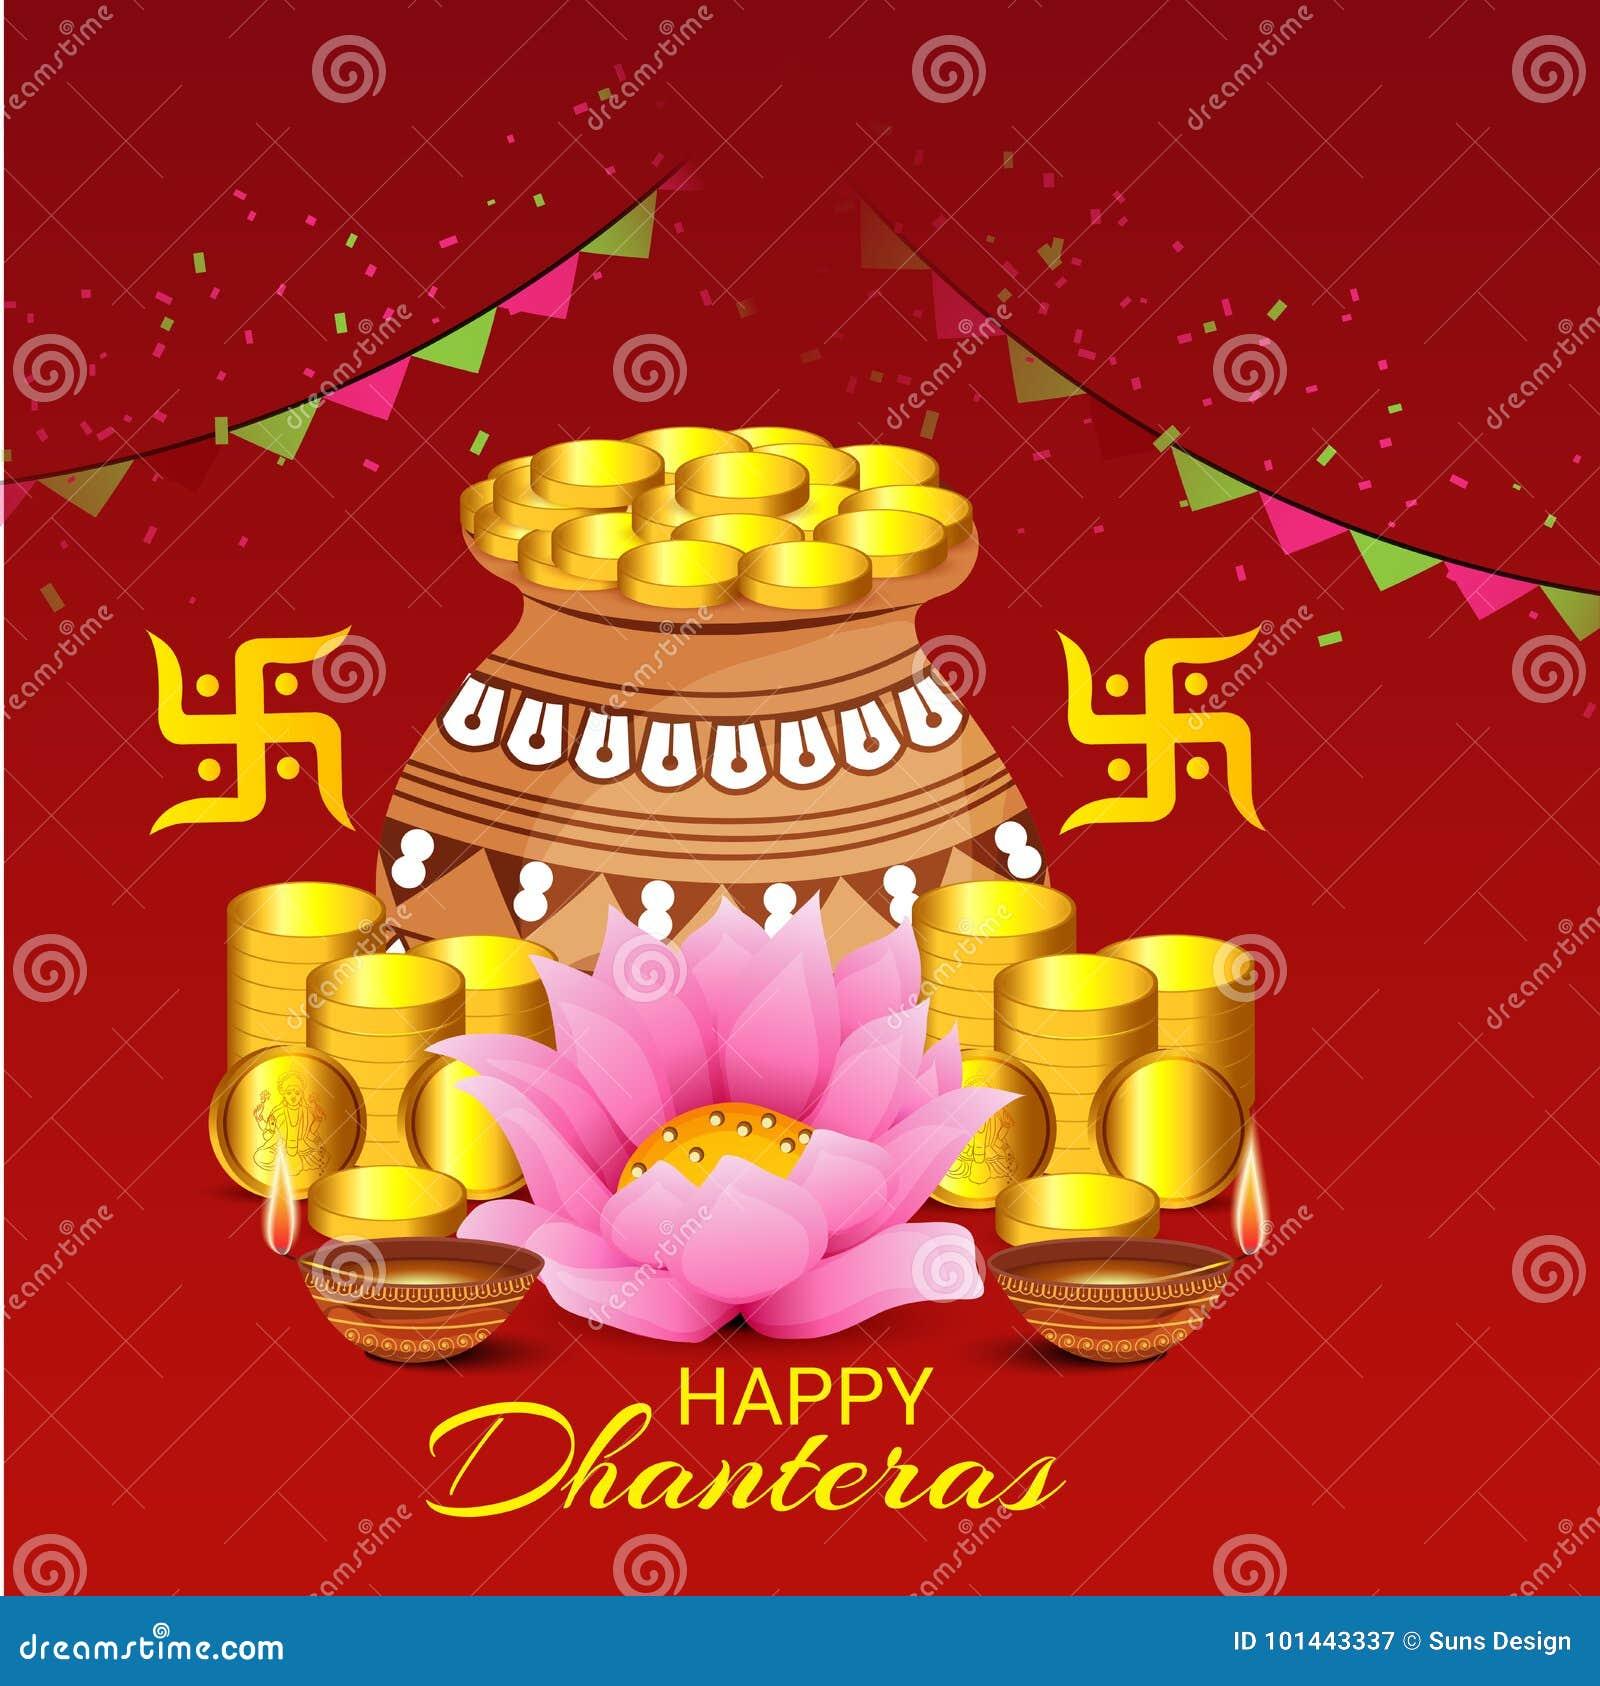 Dhanteras stock illustration illustration of design 101443337 illustration of a banner for happy dhanteras m4hsunfo